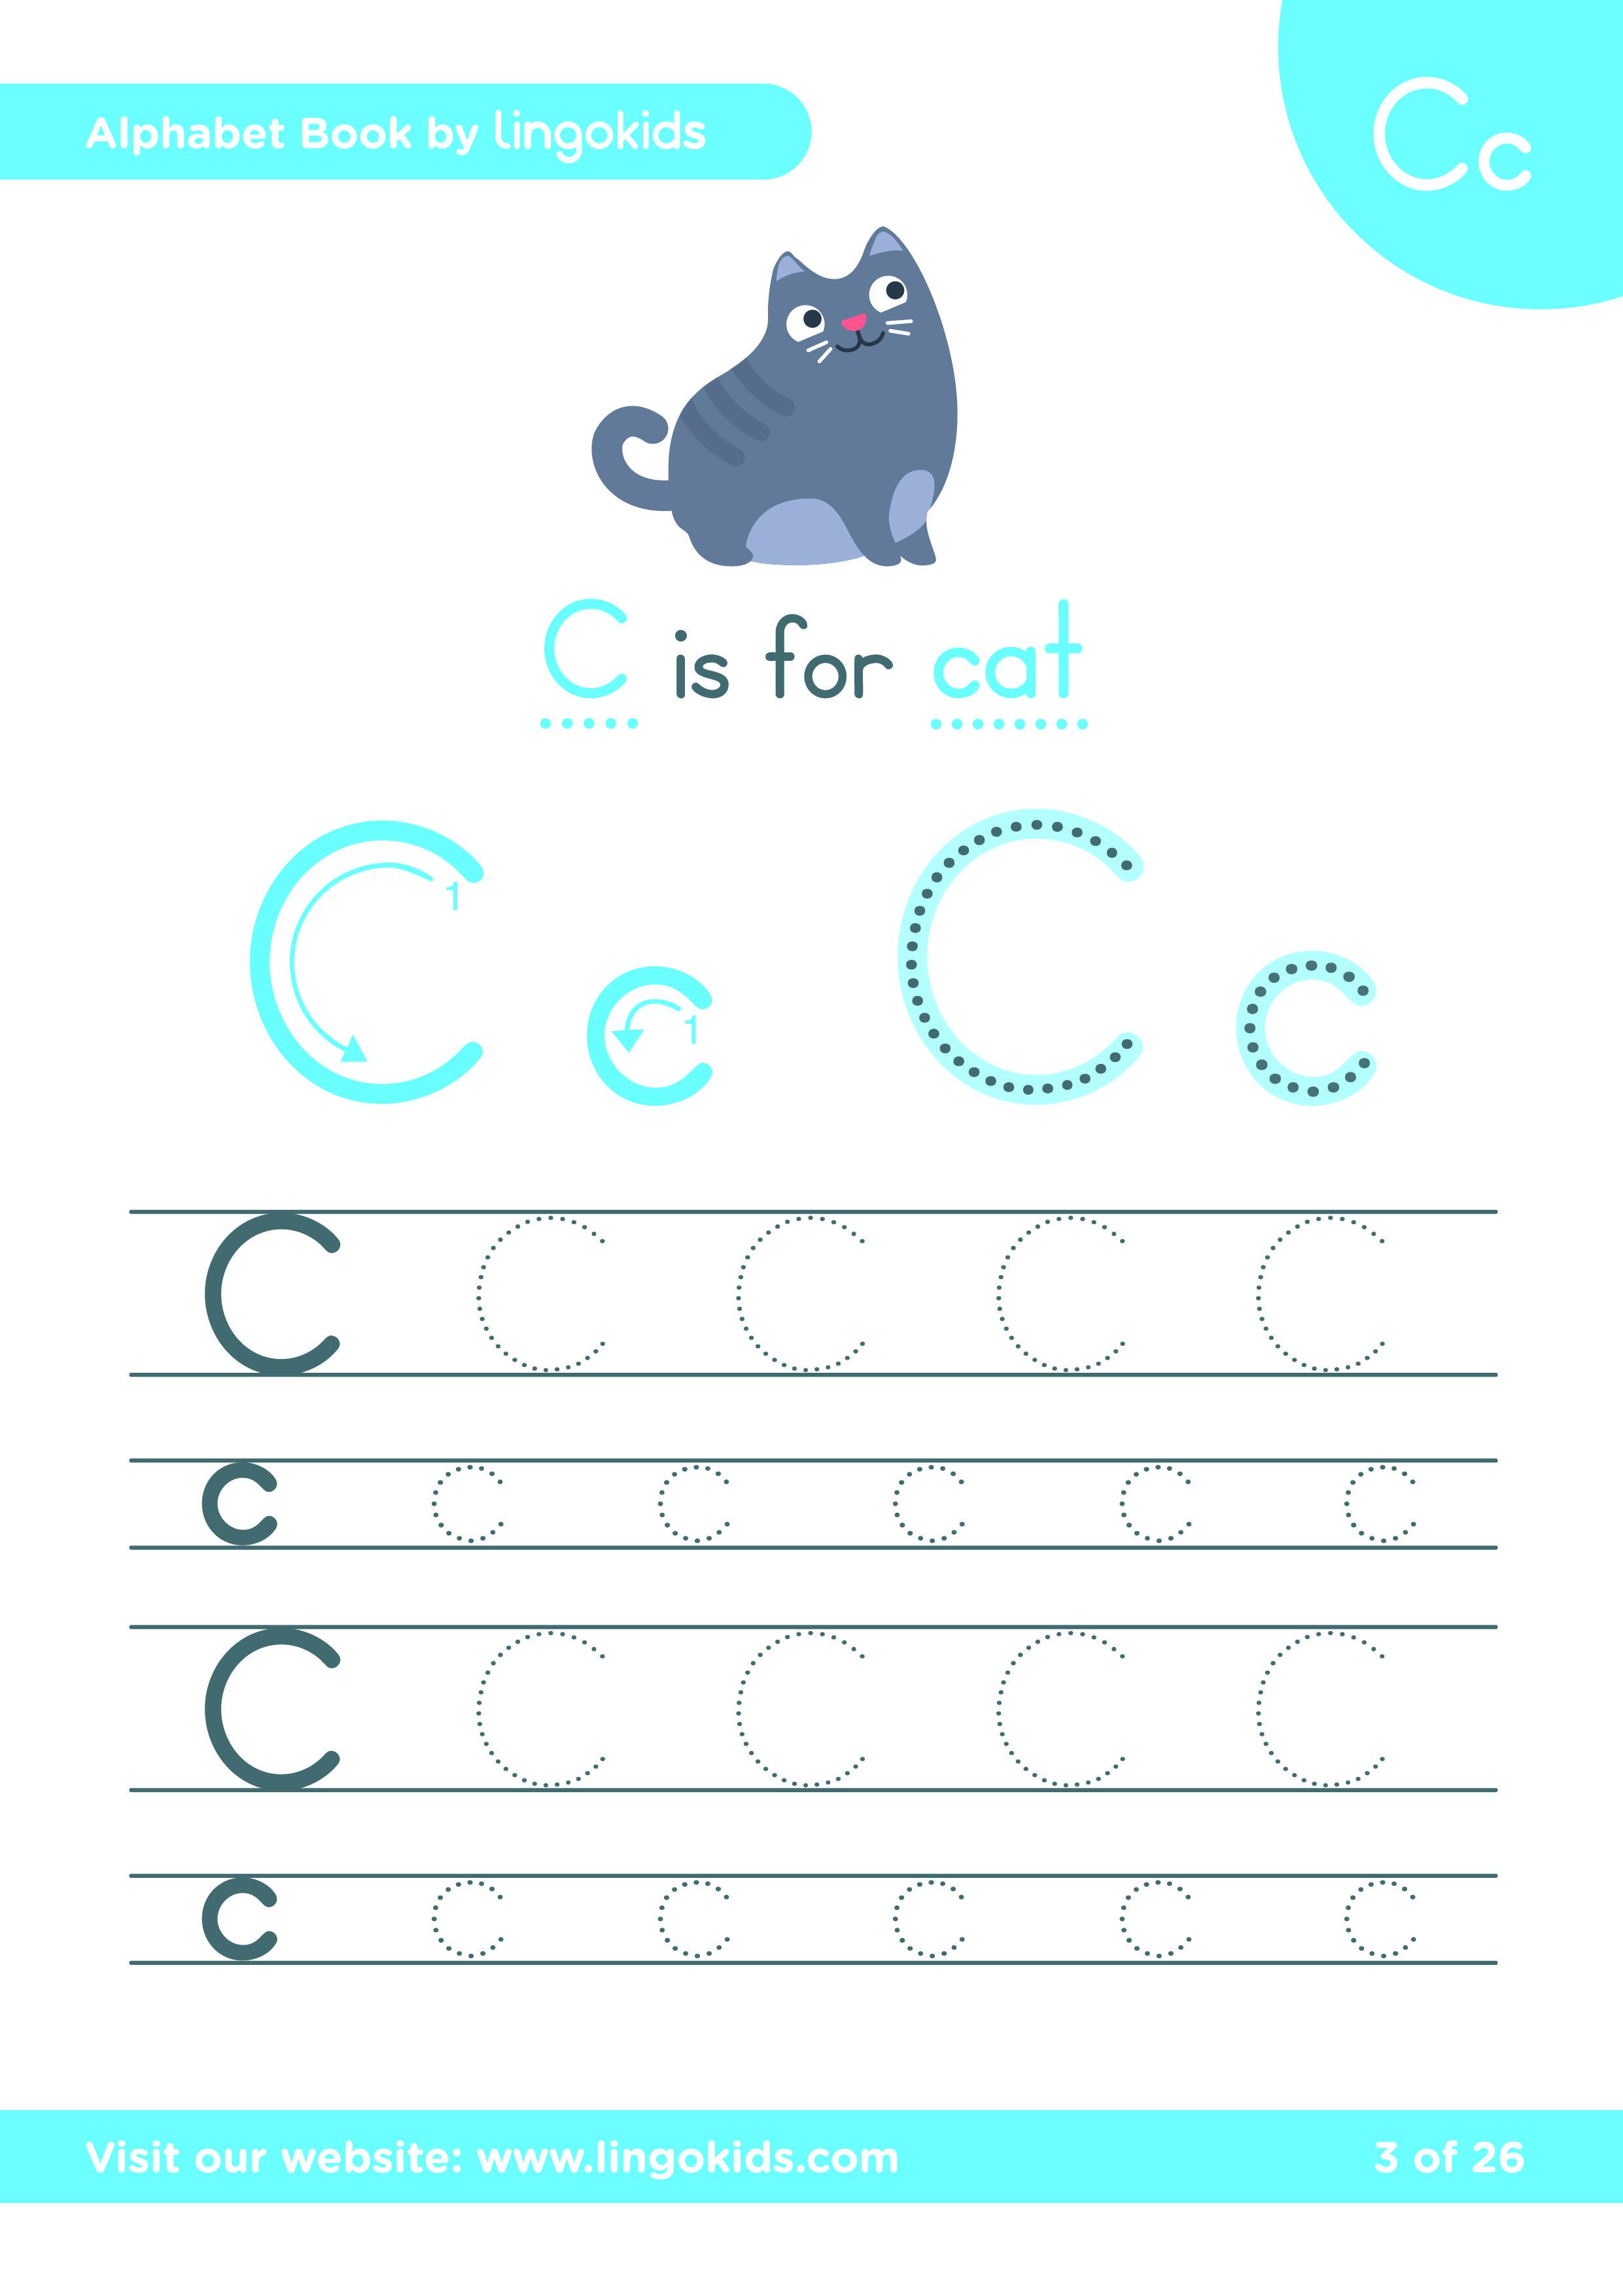 CAT Initials Alphabet FUN Note Pads!